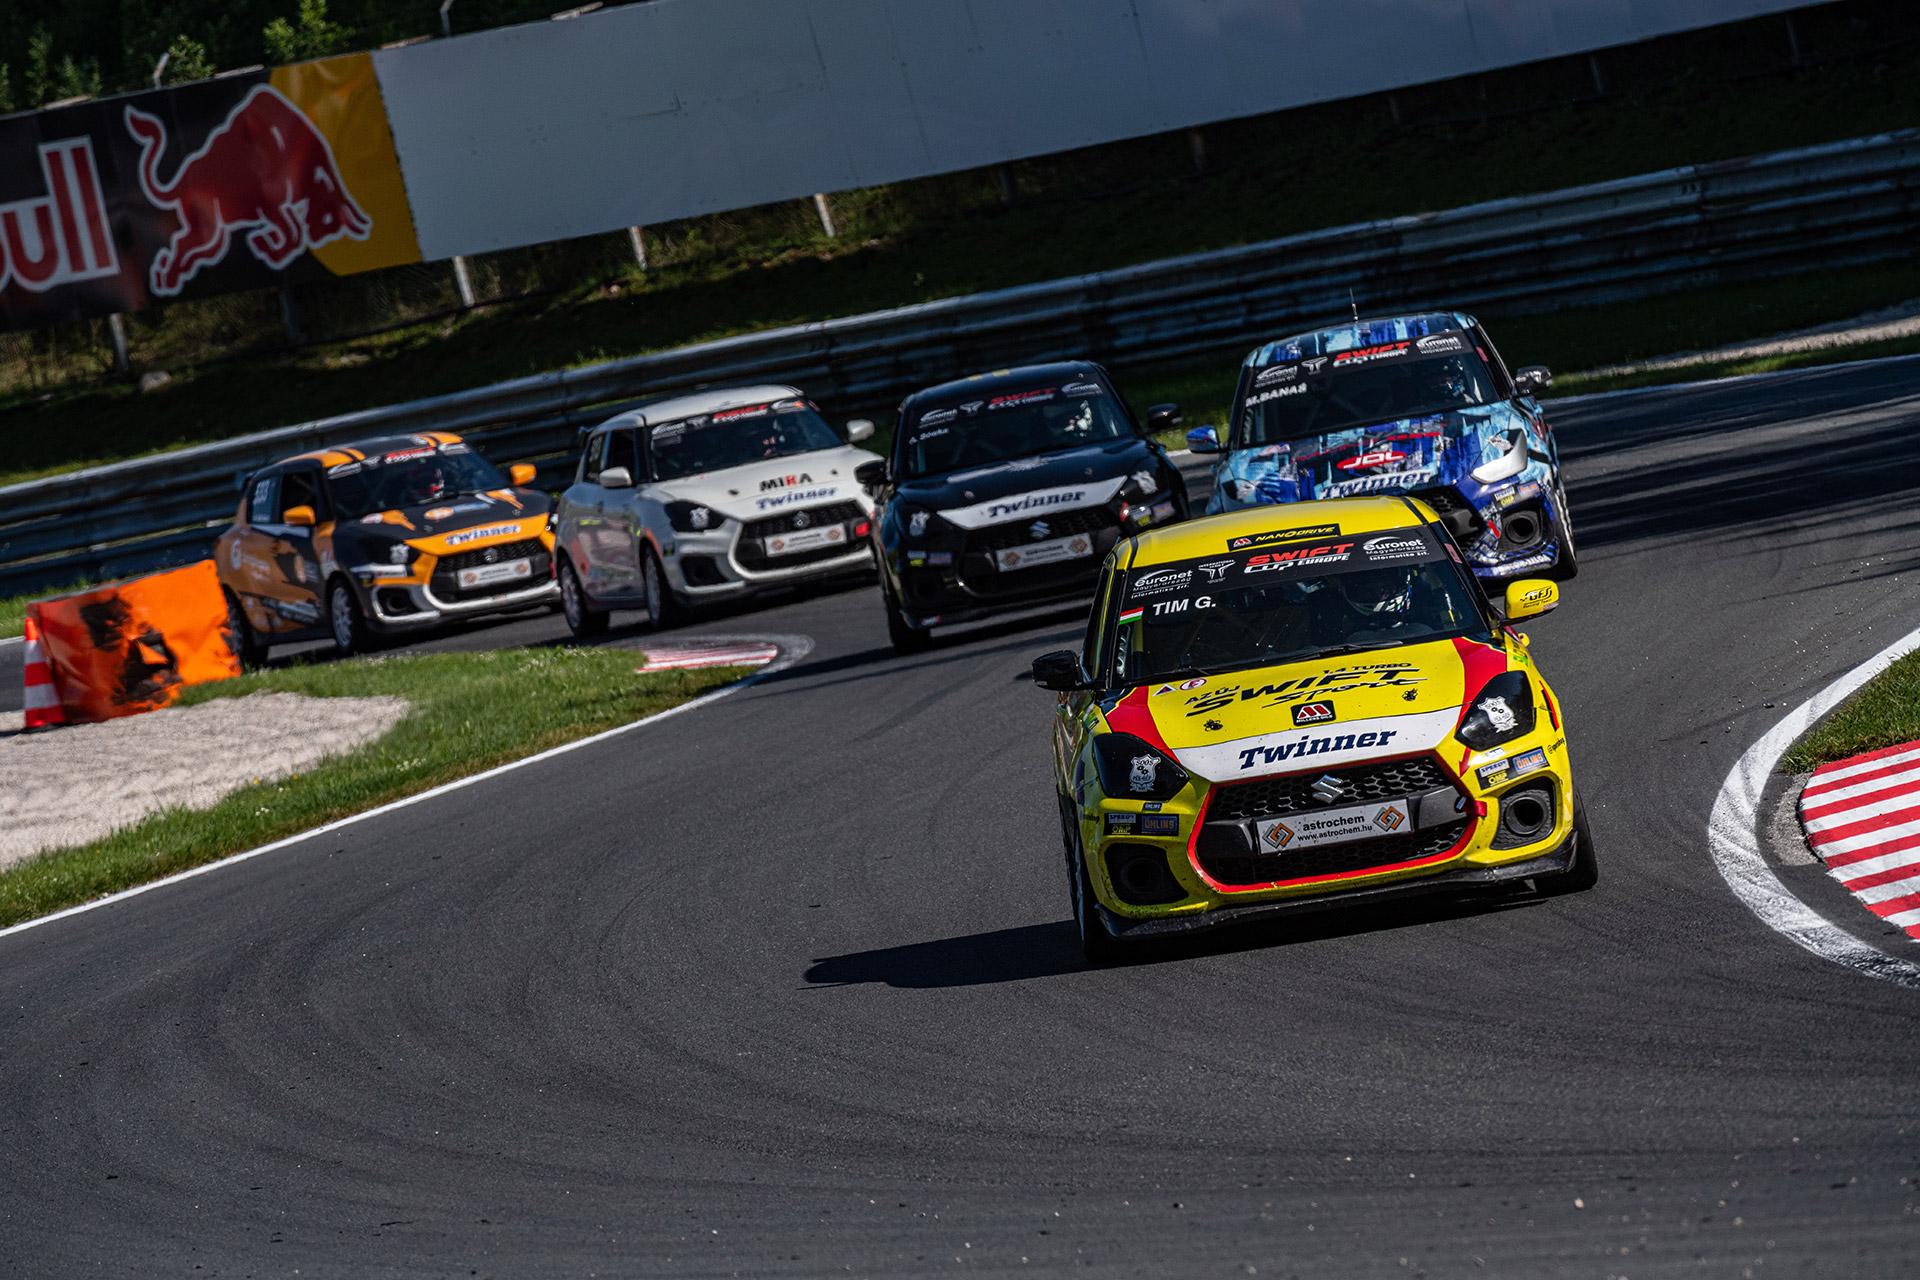 timg_2021_salzburgring17.jpg